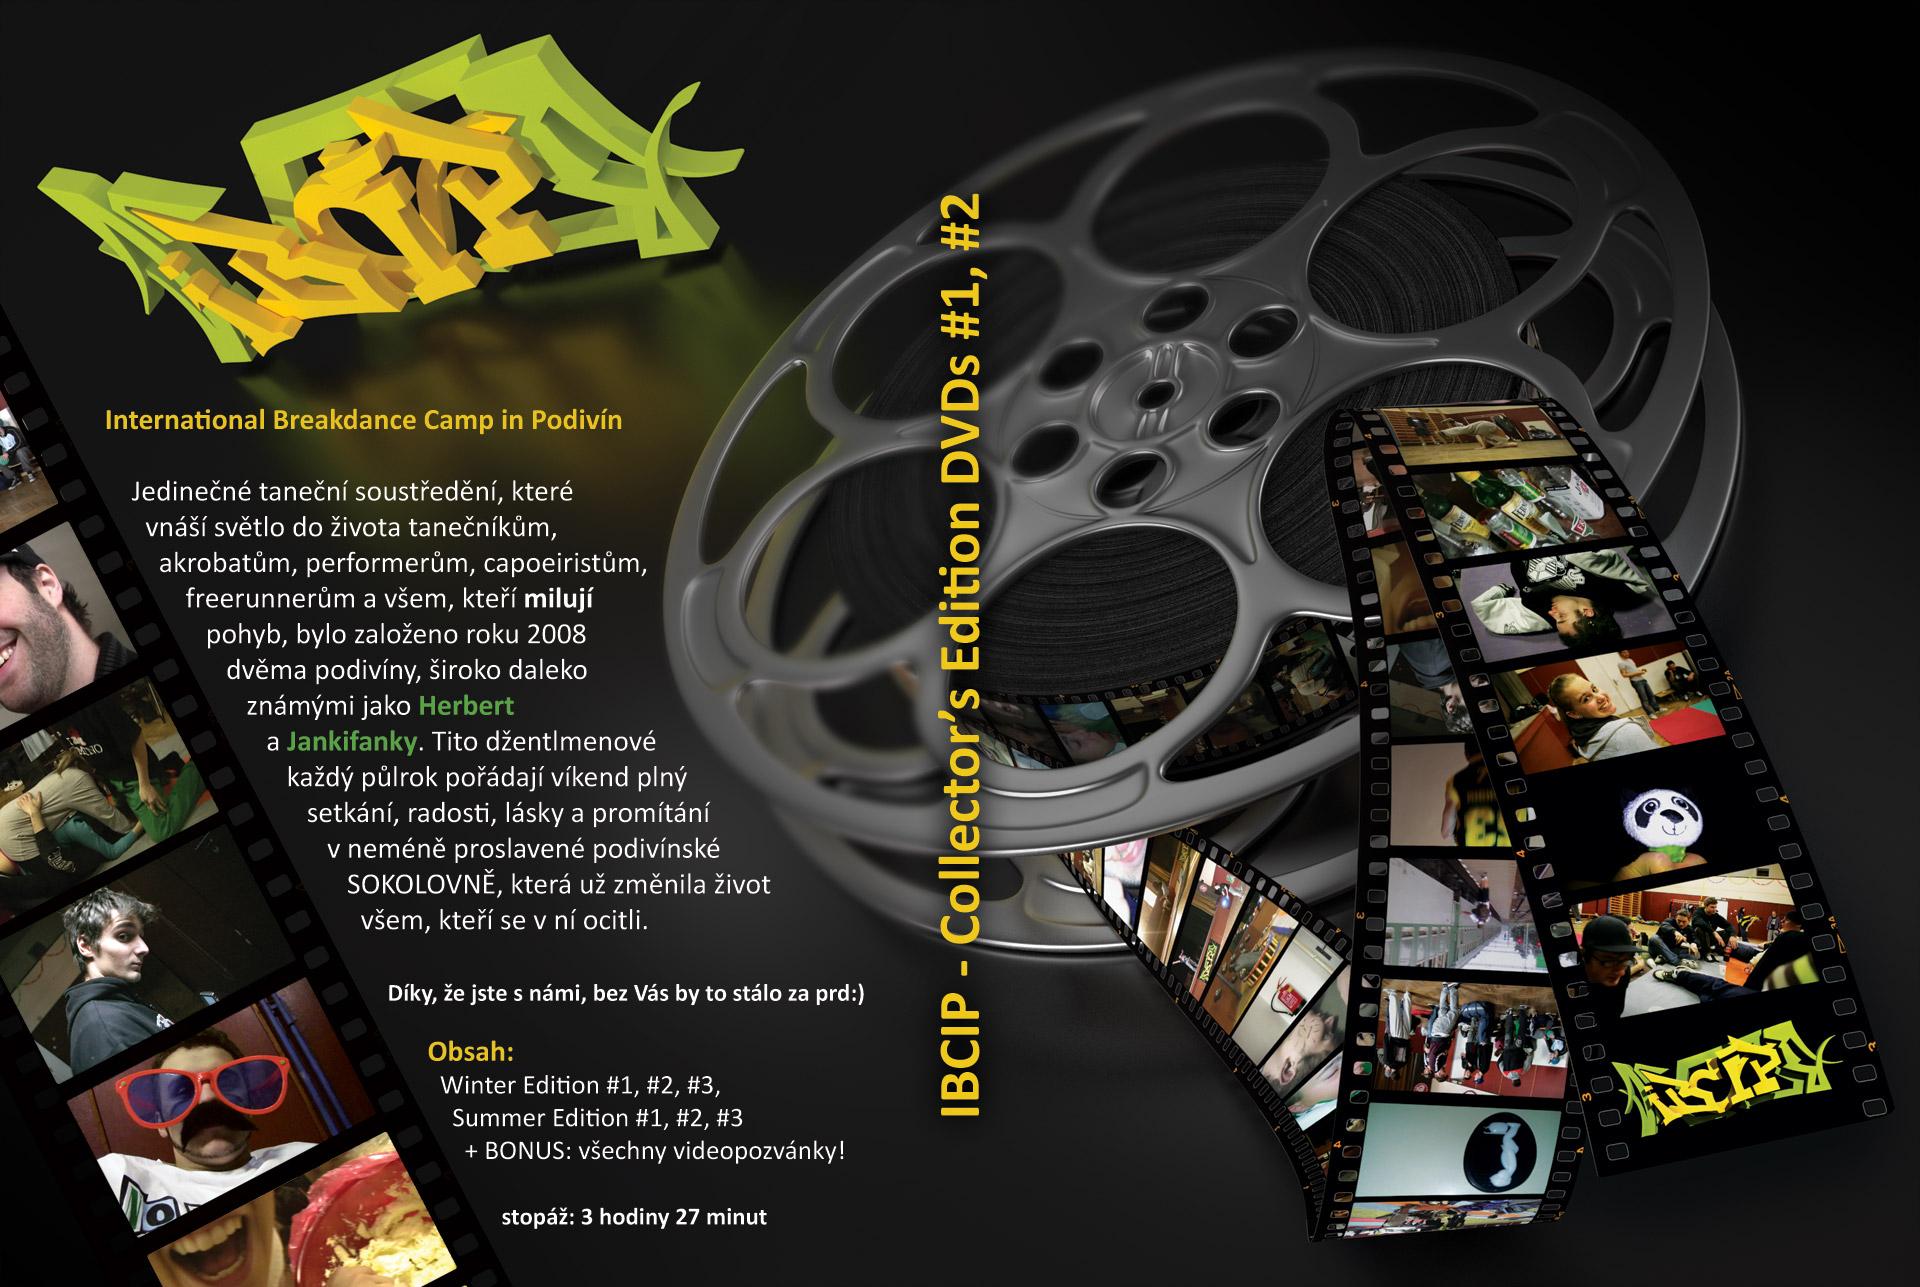 ibcip-dvd-case